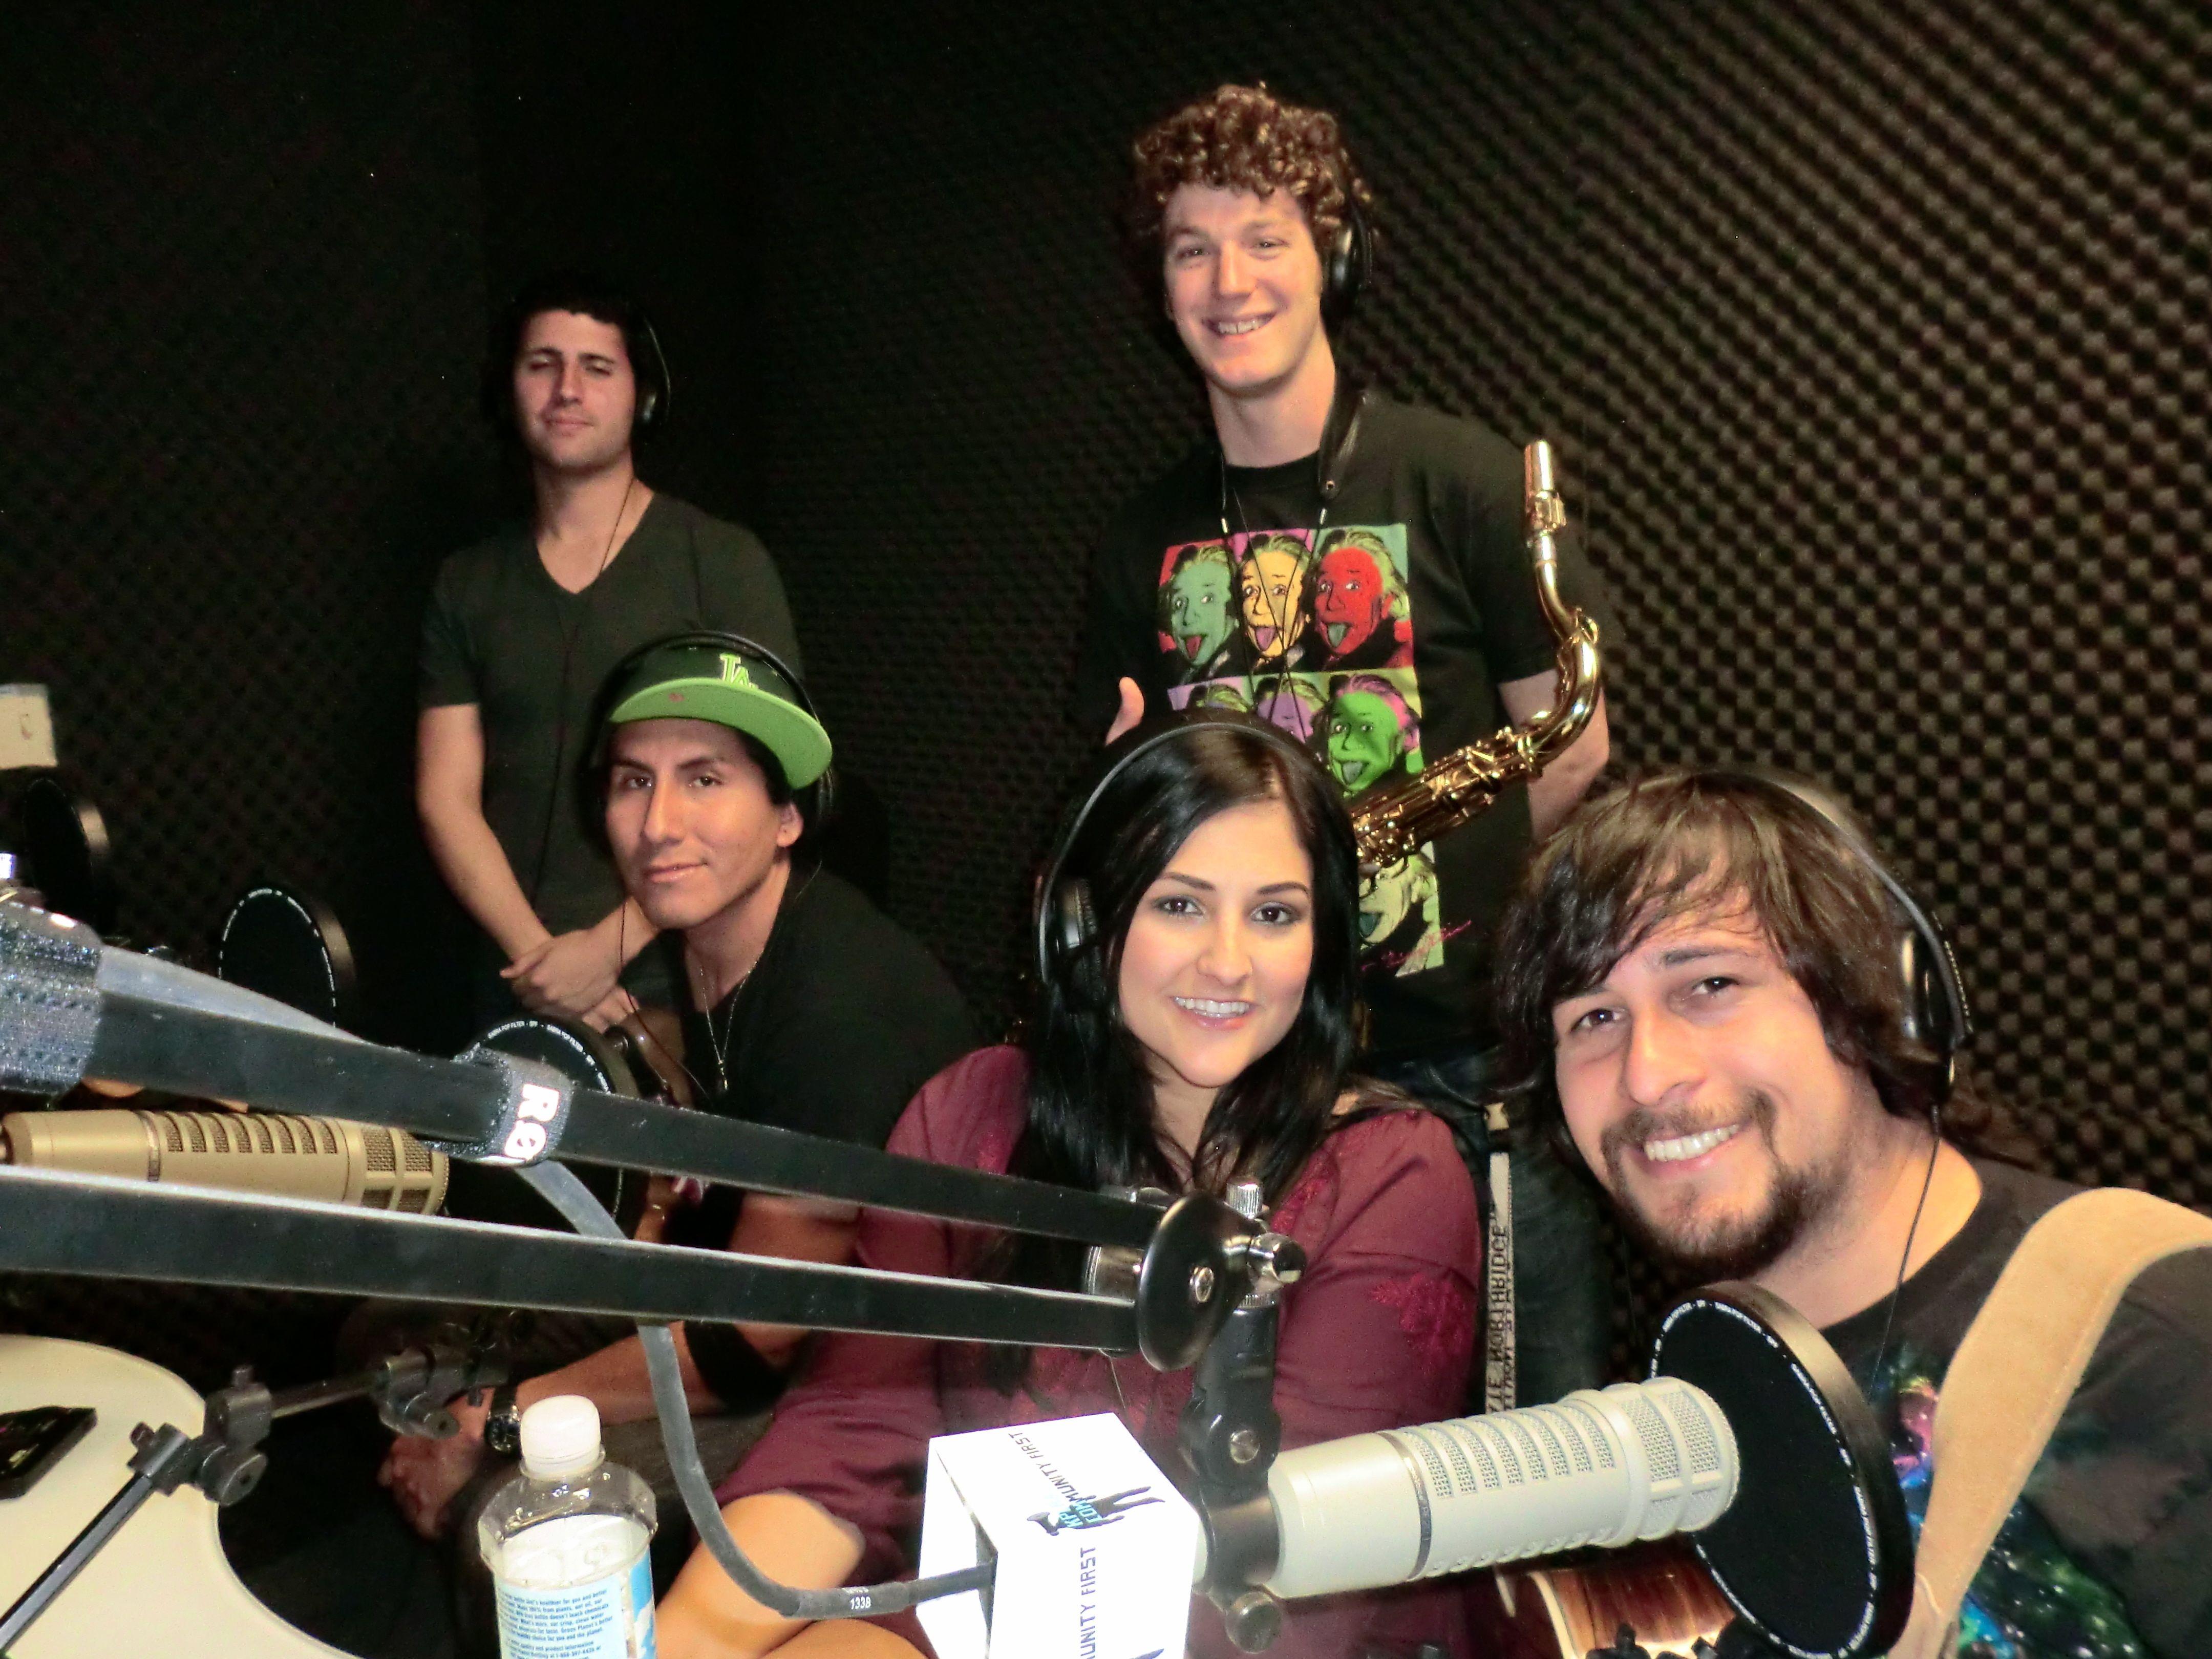 Listen: Encuentro Latino – PapaFish The Band!